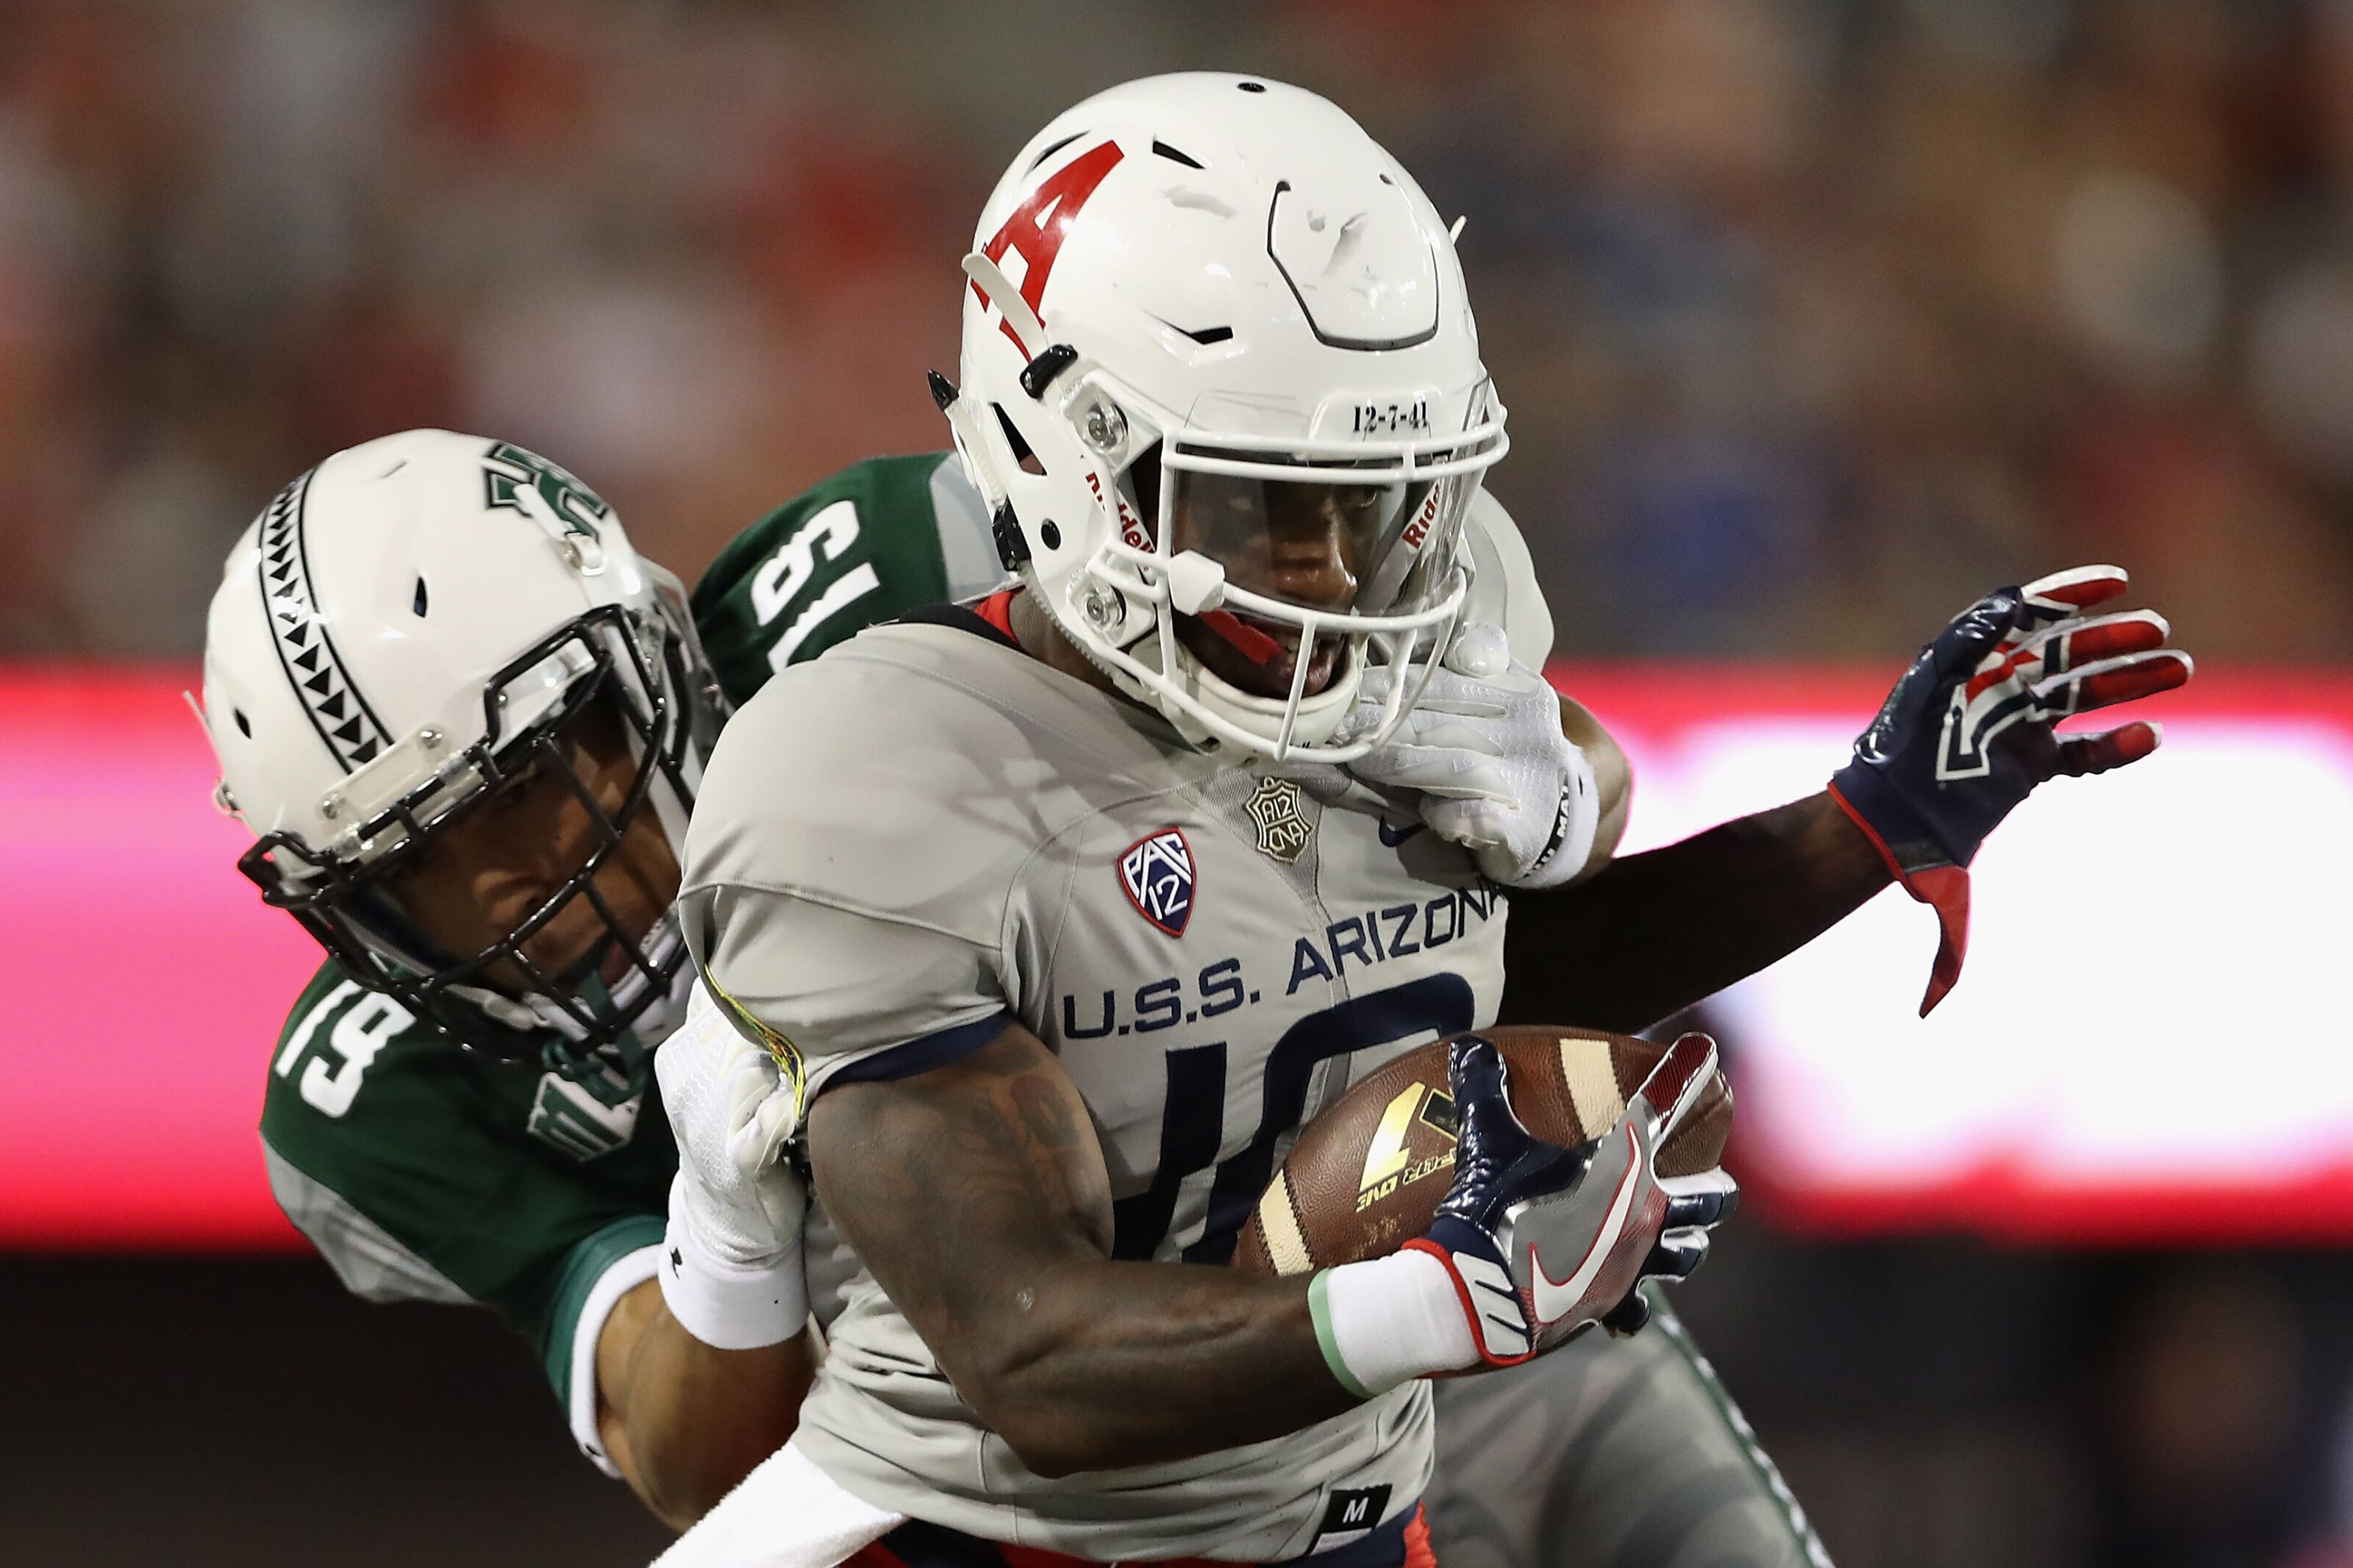 Arizona Football: 3 takeaways from shootout loss to Hawaii